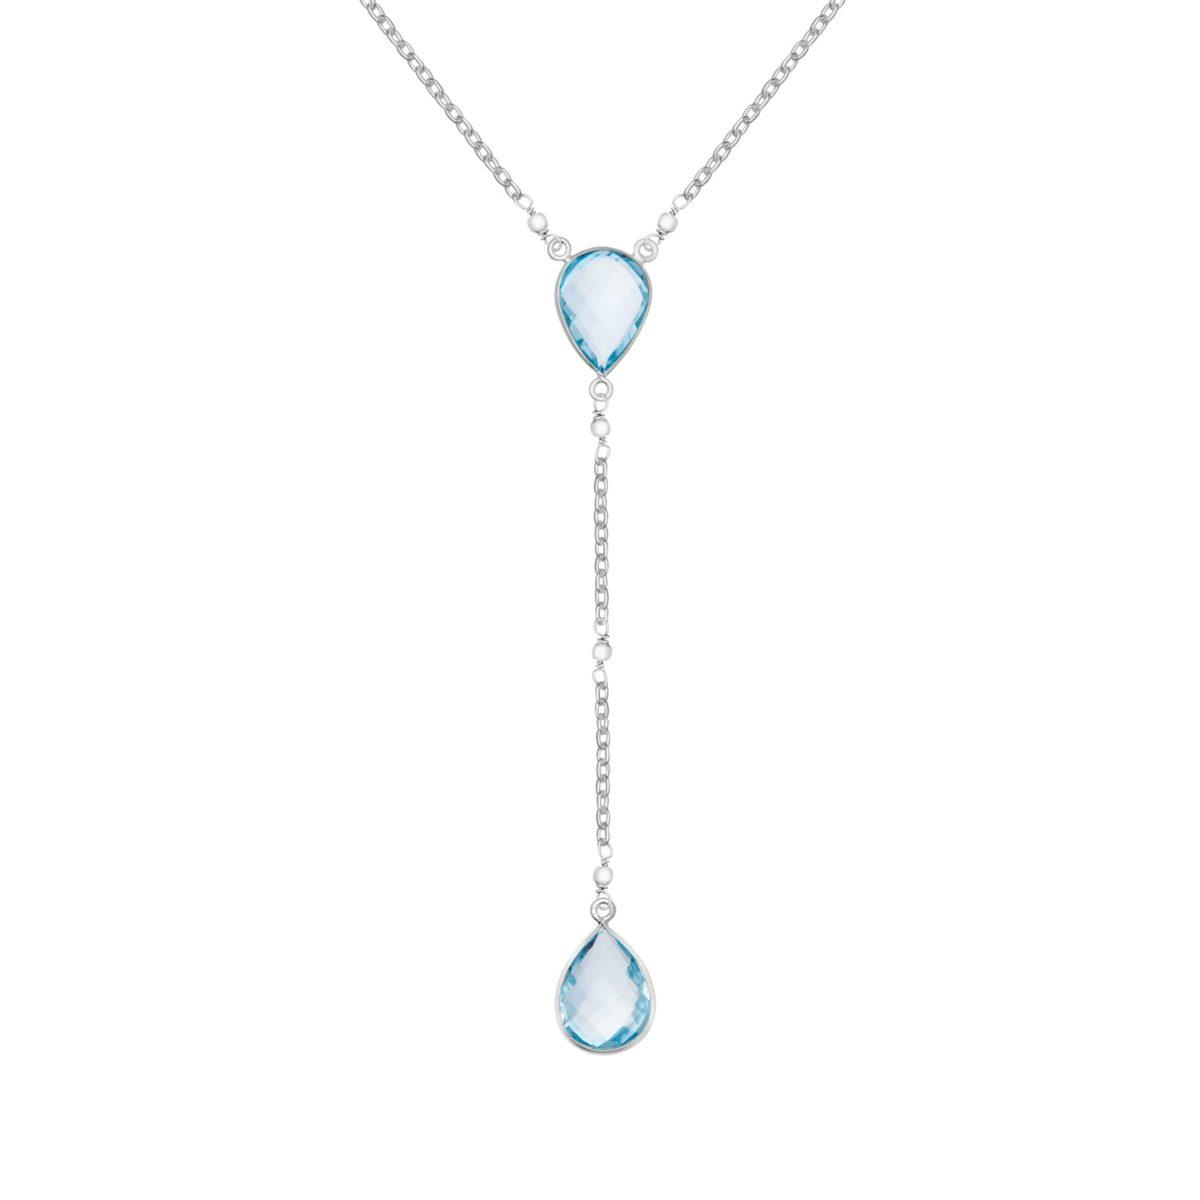 Shakara Jewellery, Droplet-collection-lariat-necklace-sky-blue-topaz.